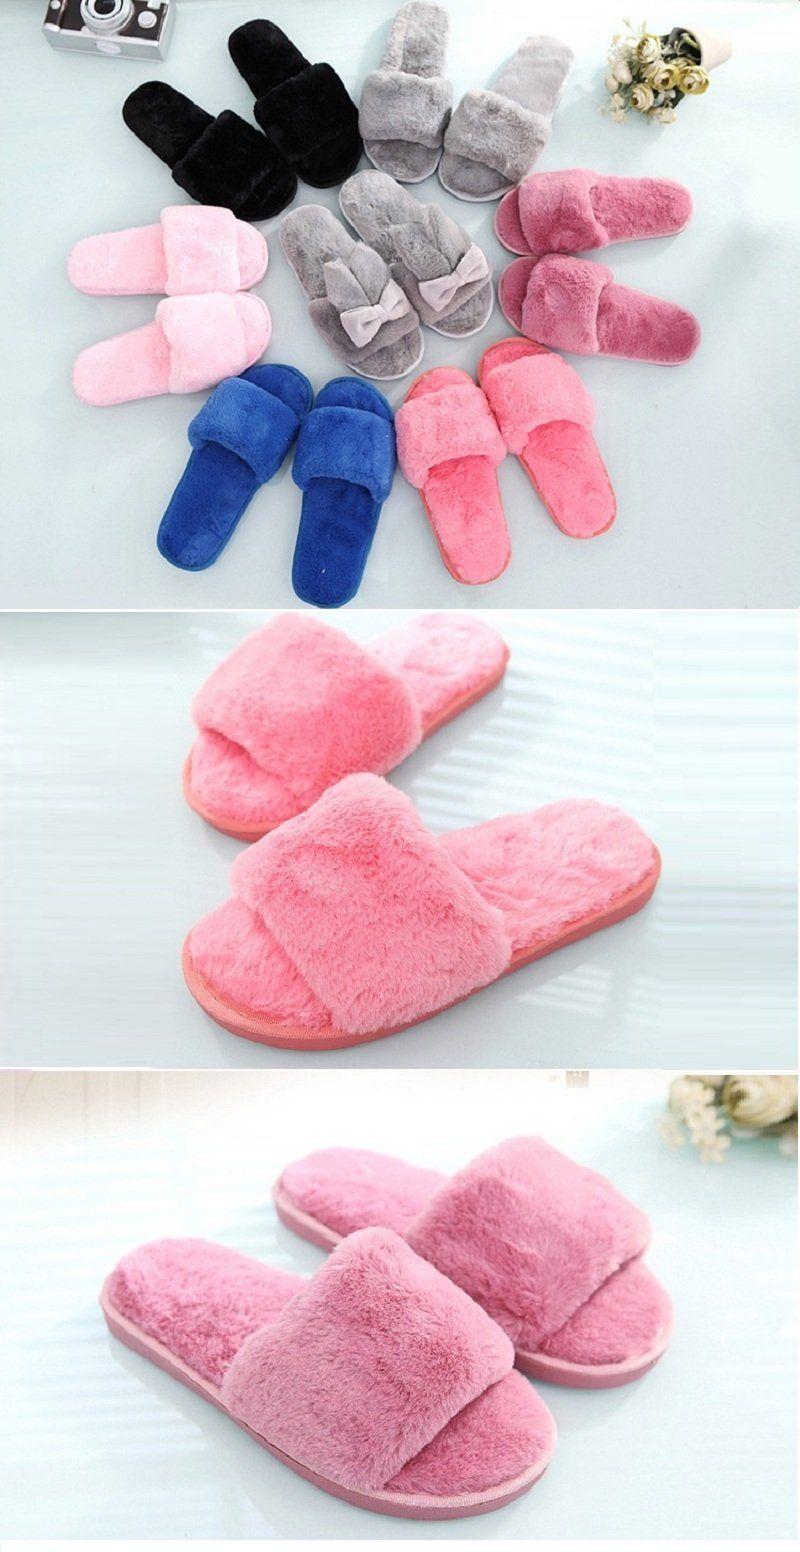 081908e6d44fce MOSHU - Designer Fluffy Fur Winter Slippers Slides  by Mix Pleasurez ...